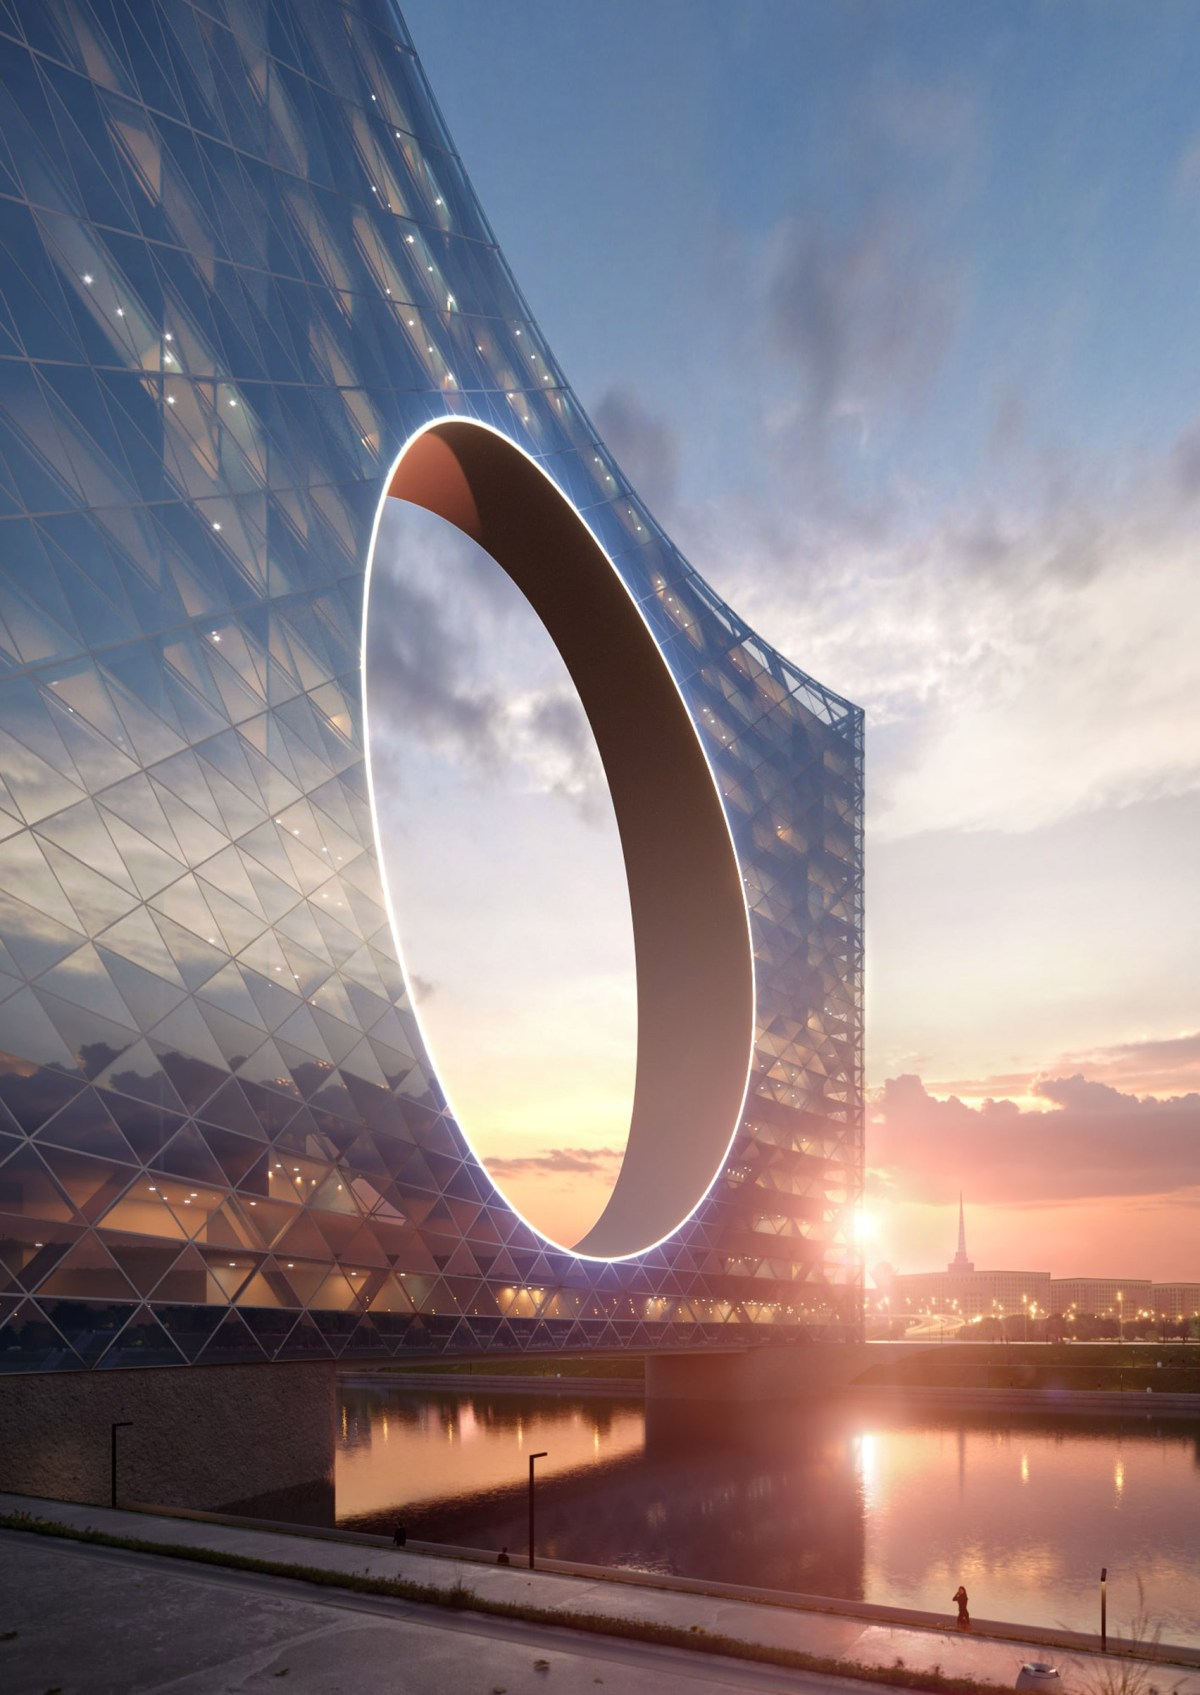 fundamental-architects-omega-render-astana-kazakhstan-flag_dezeen_1704_col_0